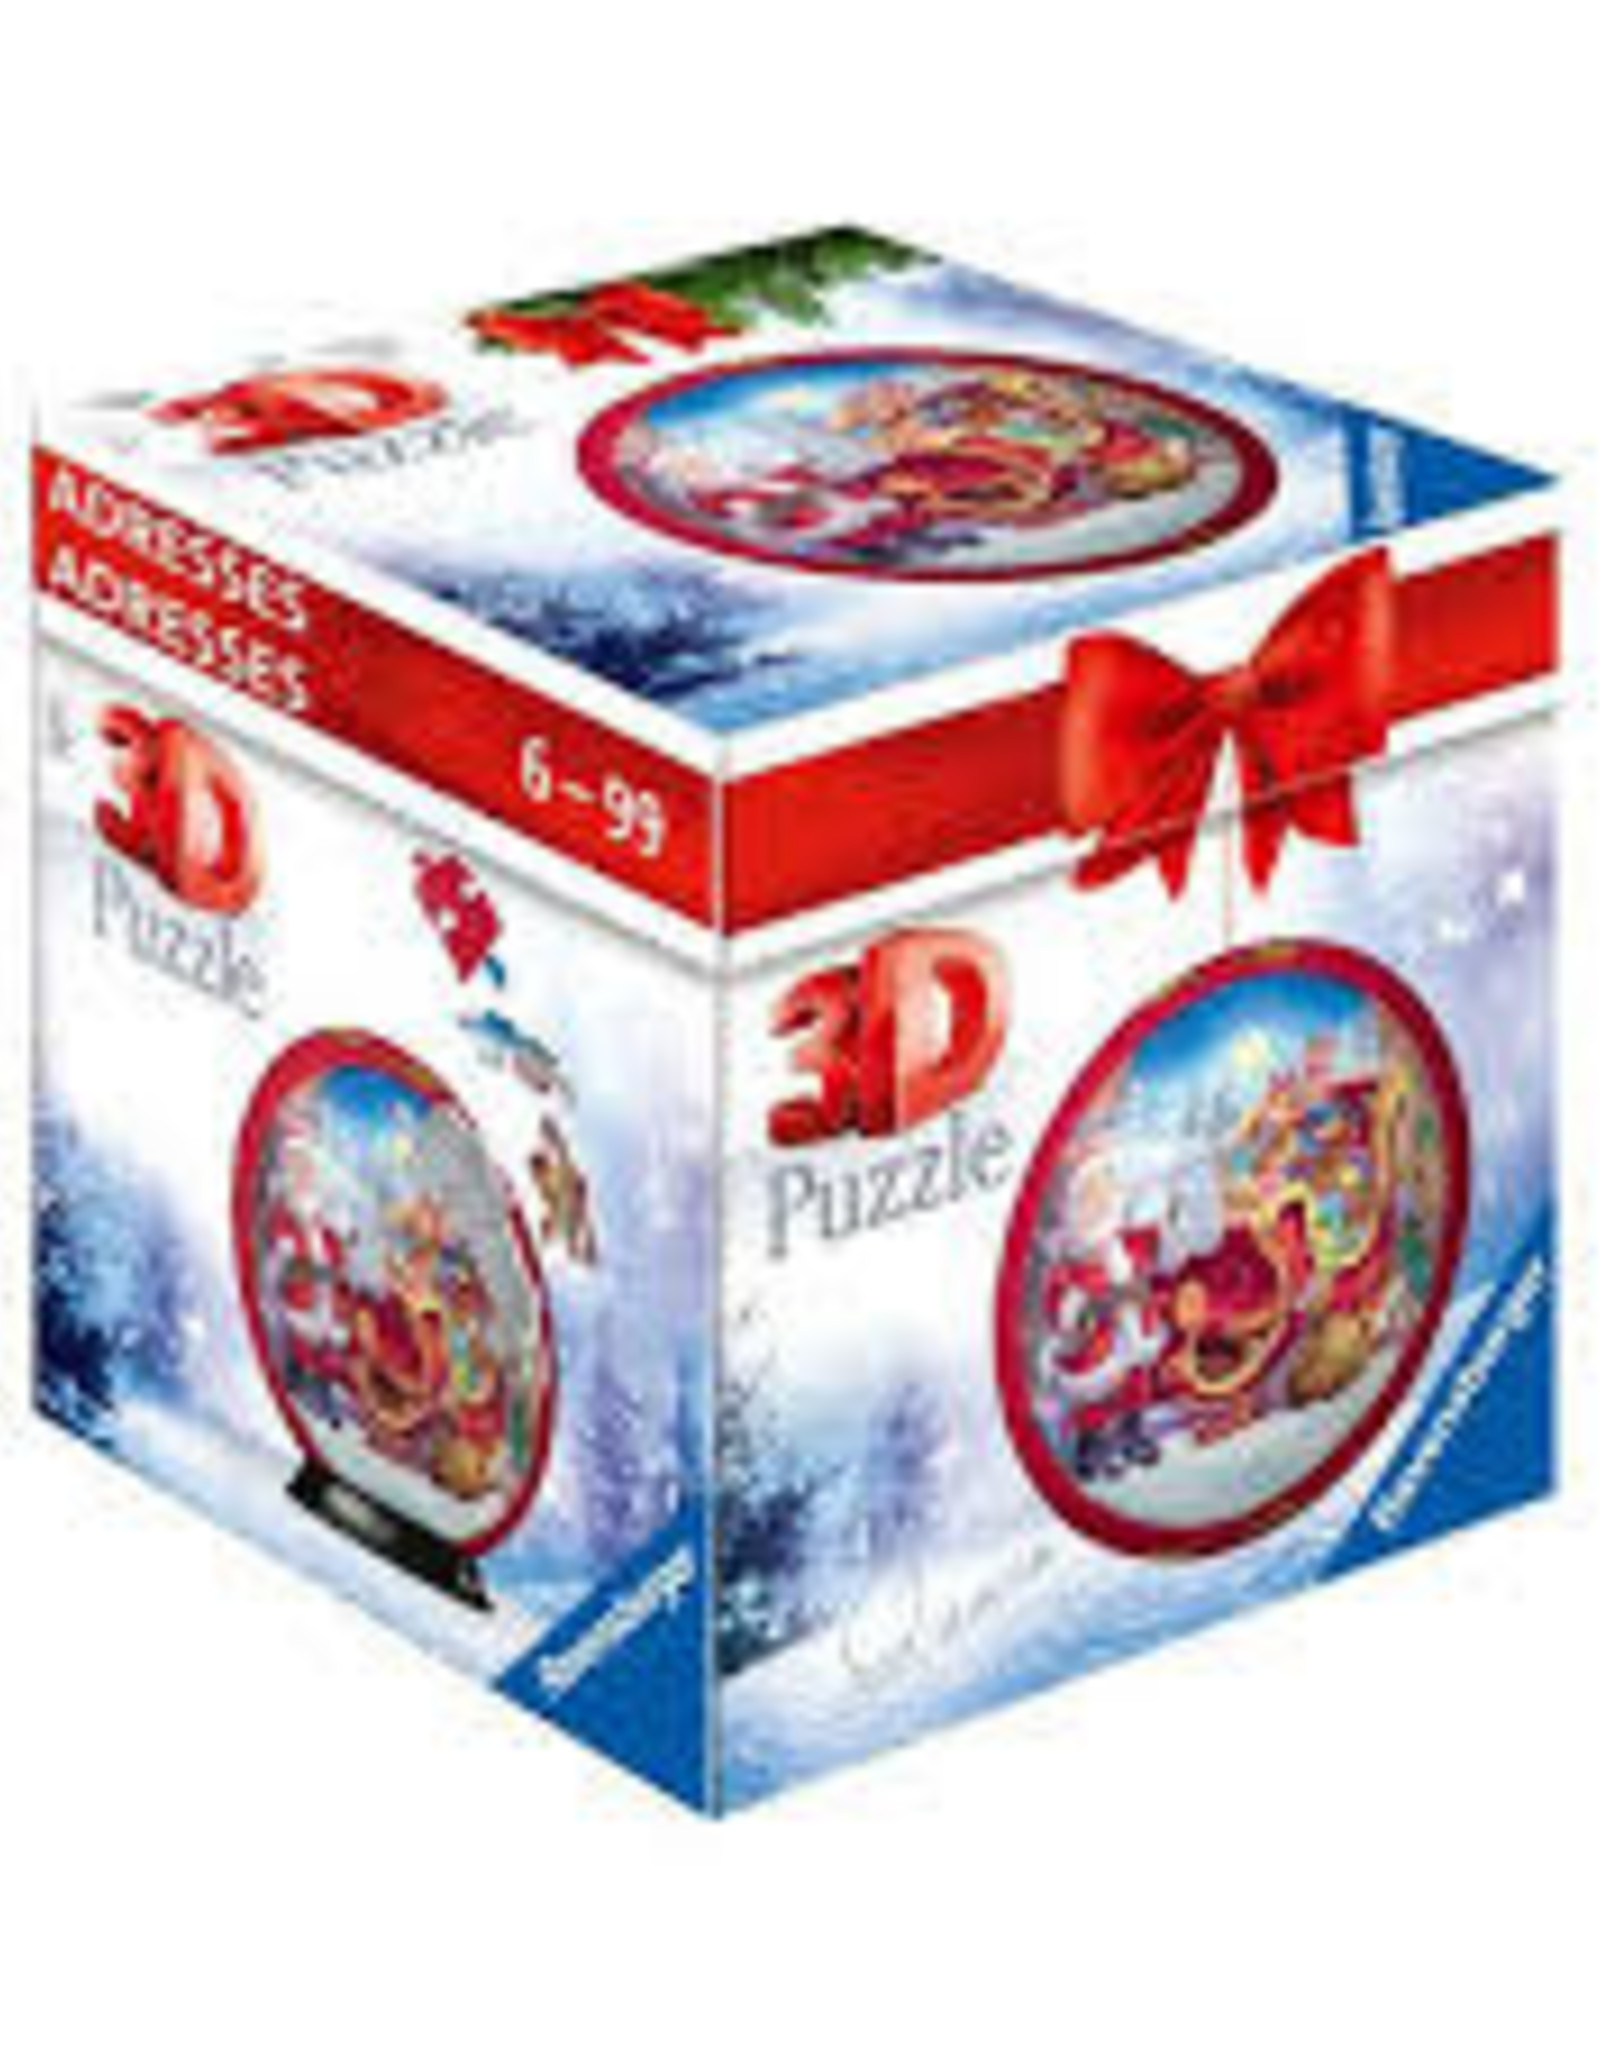 Ravensburger Christmas Ball 3D Puzzle Assortment